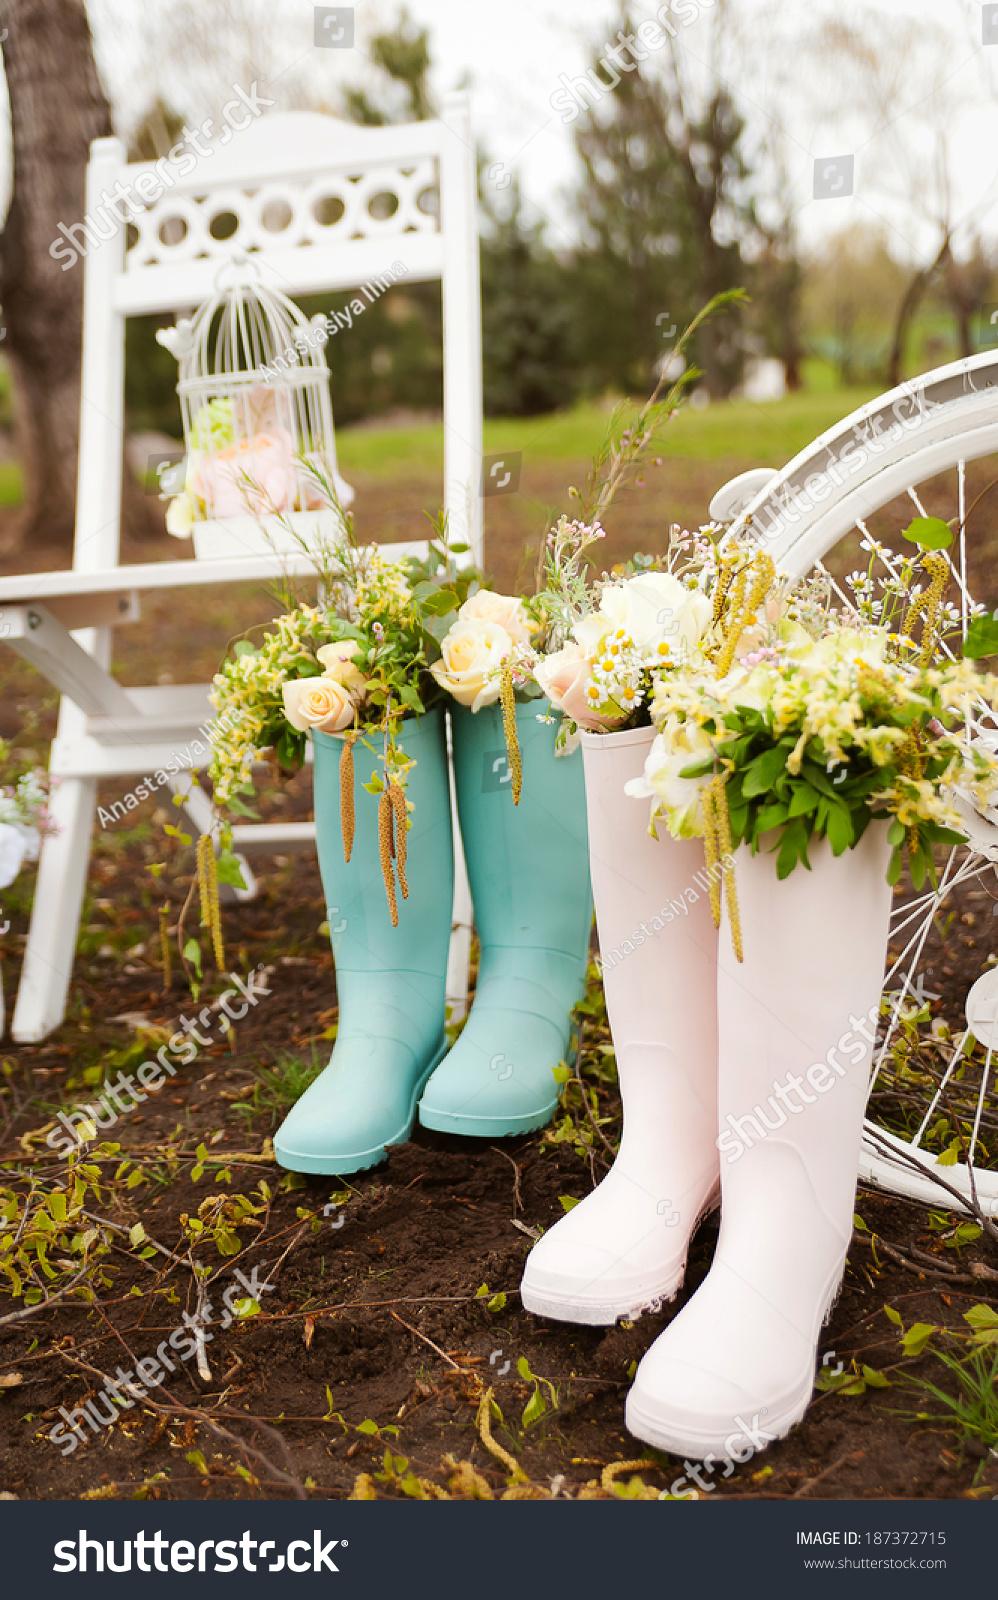 Wedding Decor Style Provence Stock Photo Edit Now 187372715